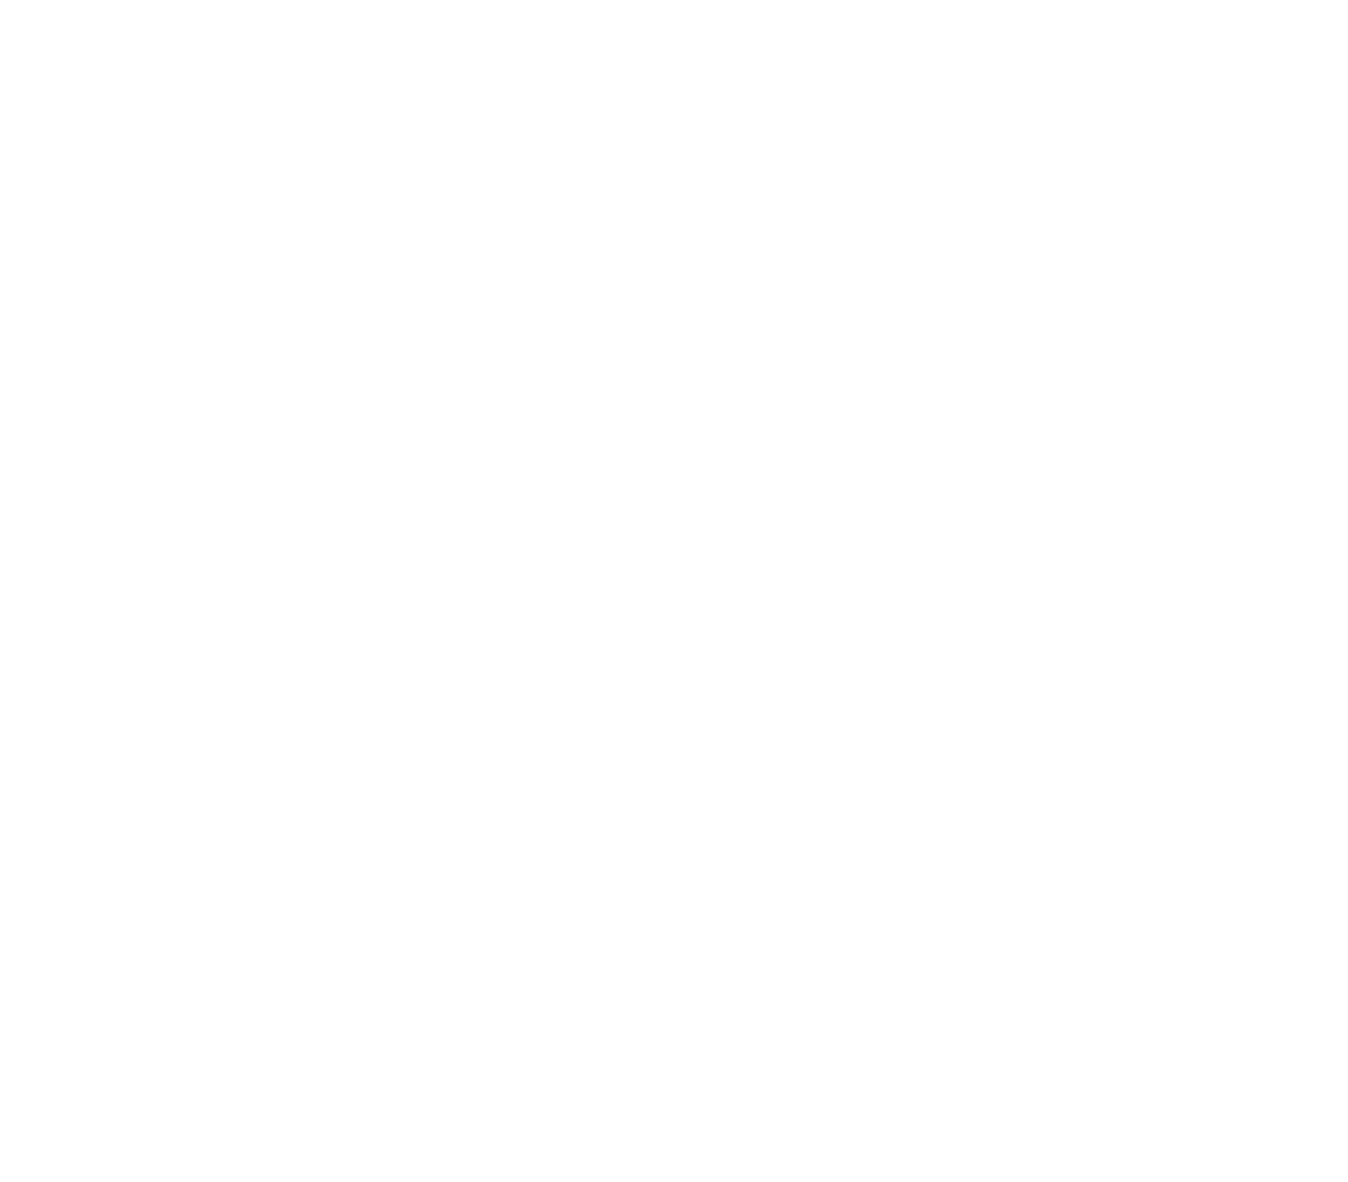 SO SOCIAL & STATIONERY